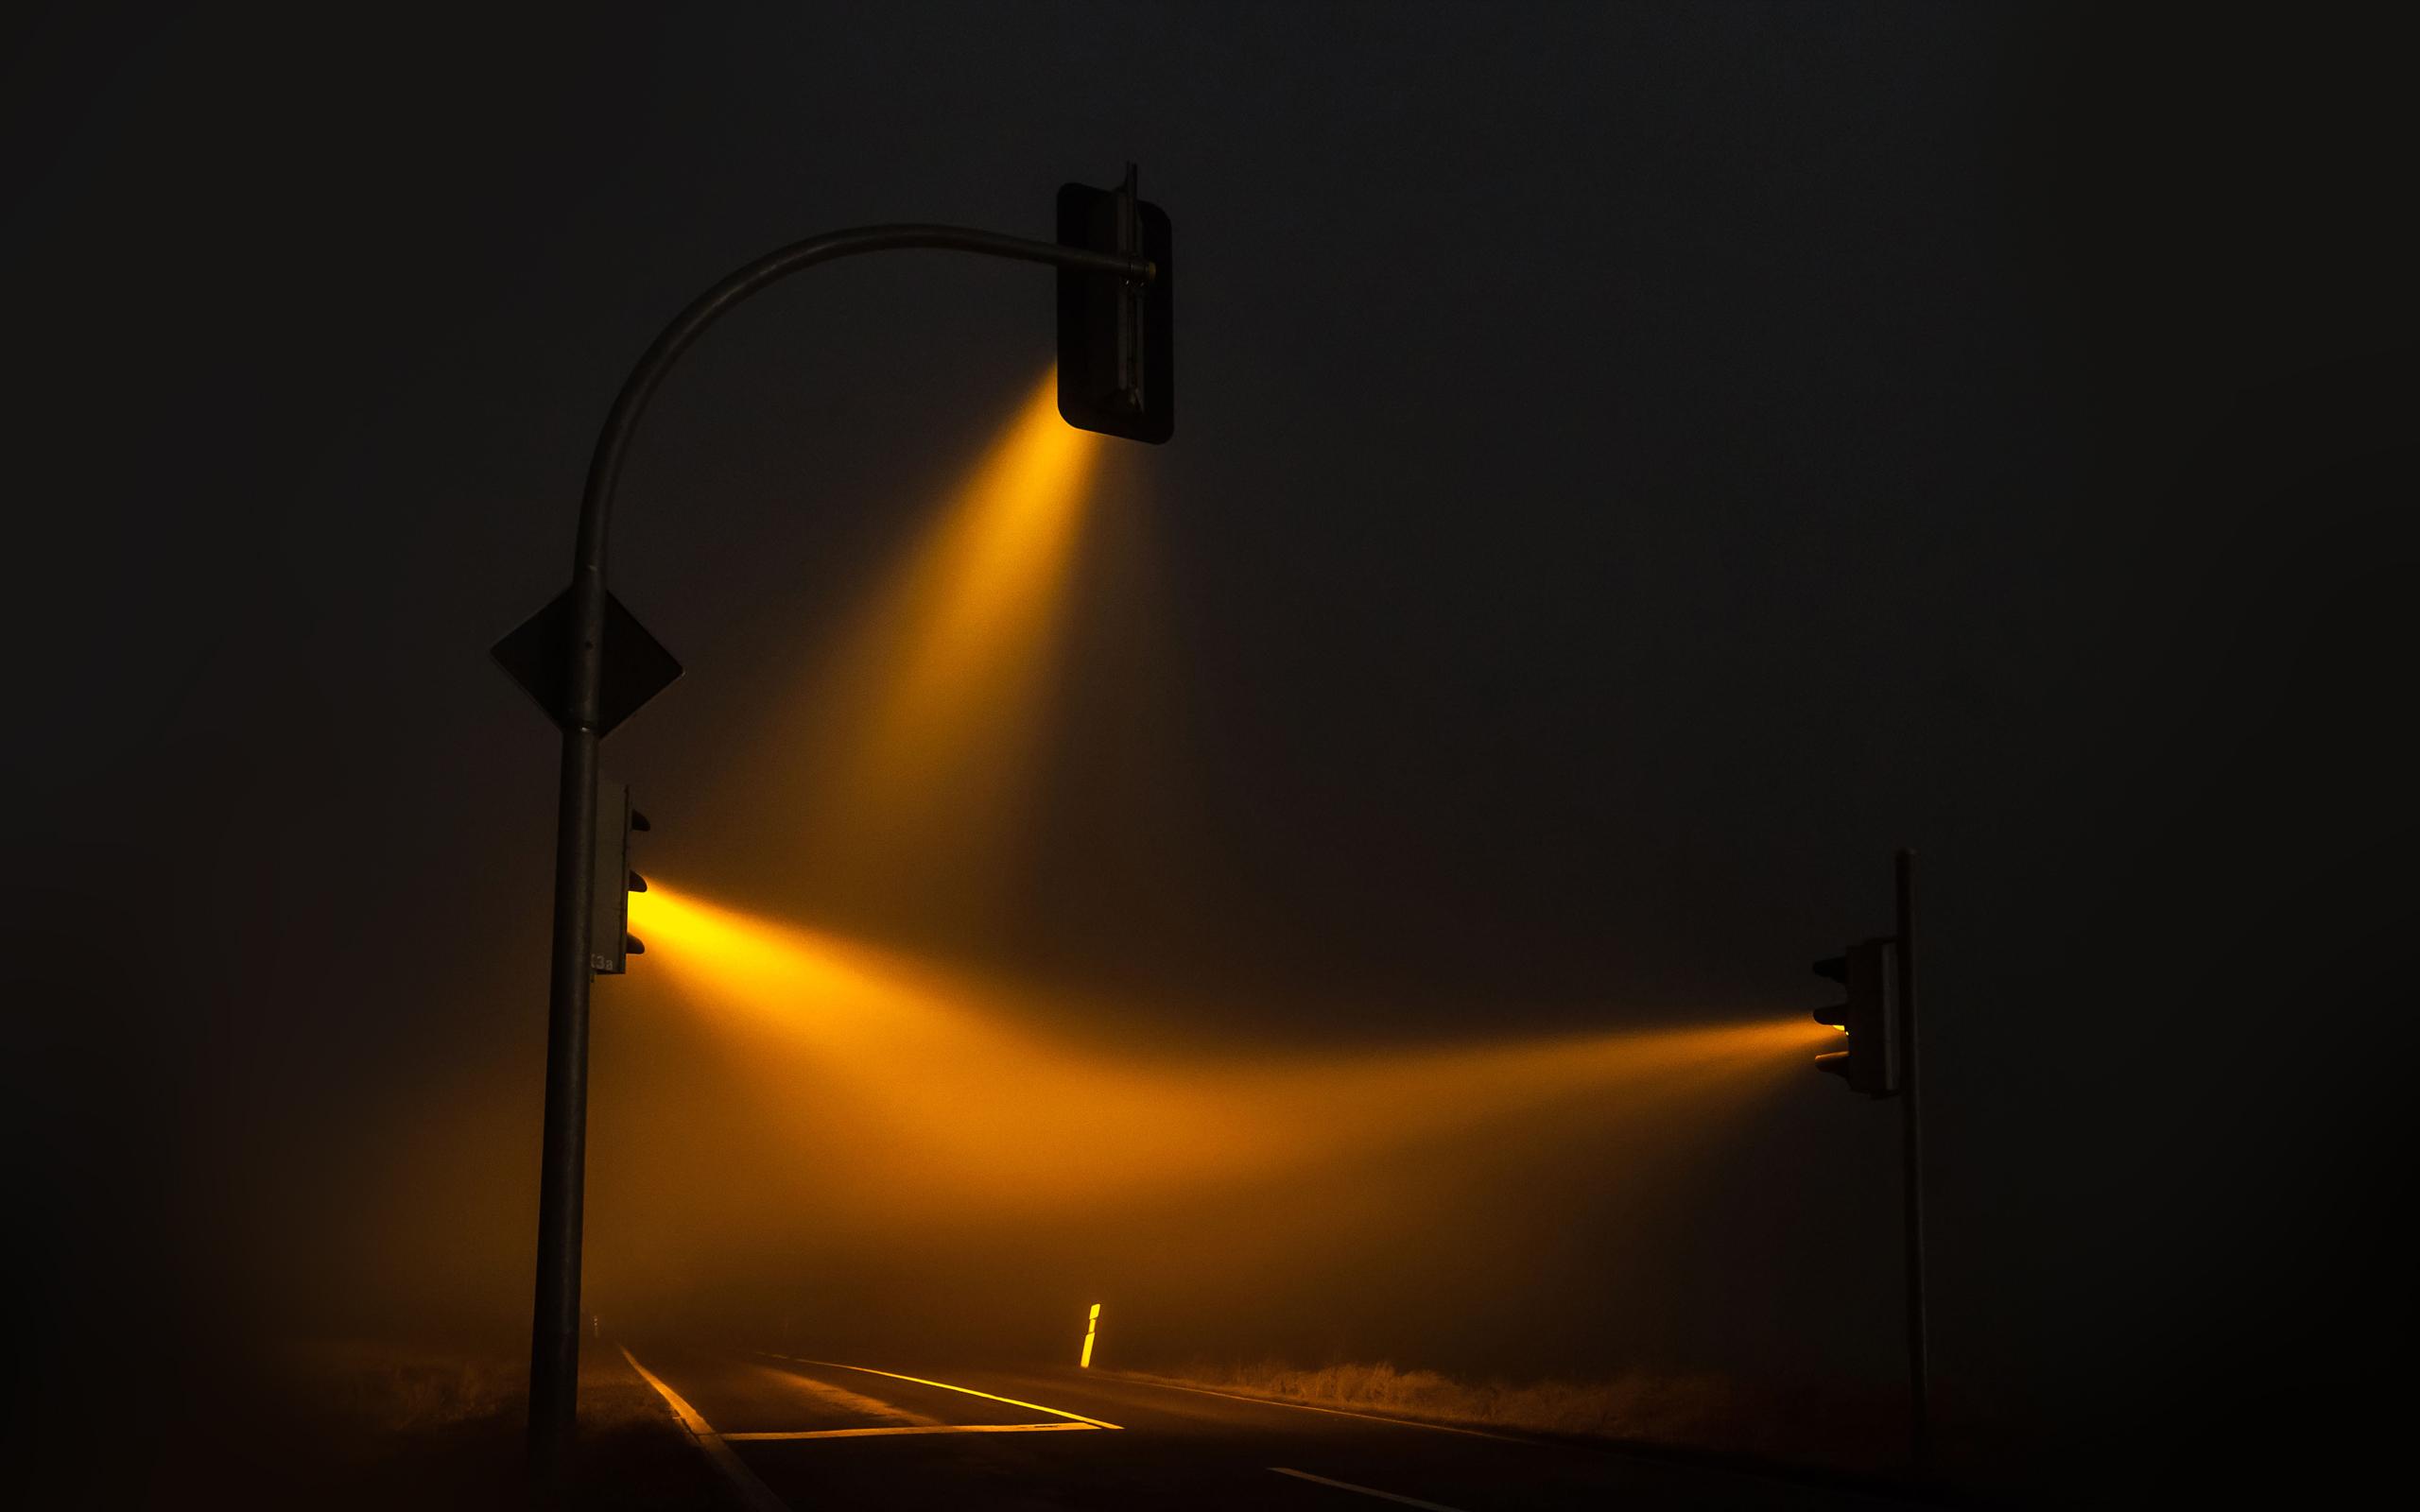 Luz amarilla, Traffic Lights, de Lucas Zimmerman.